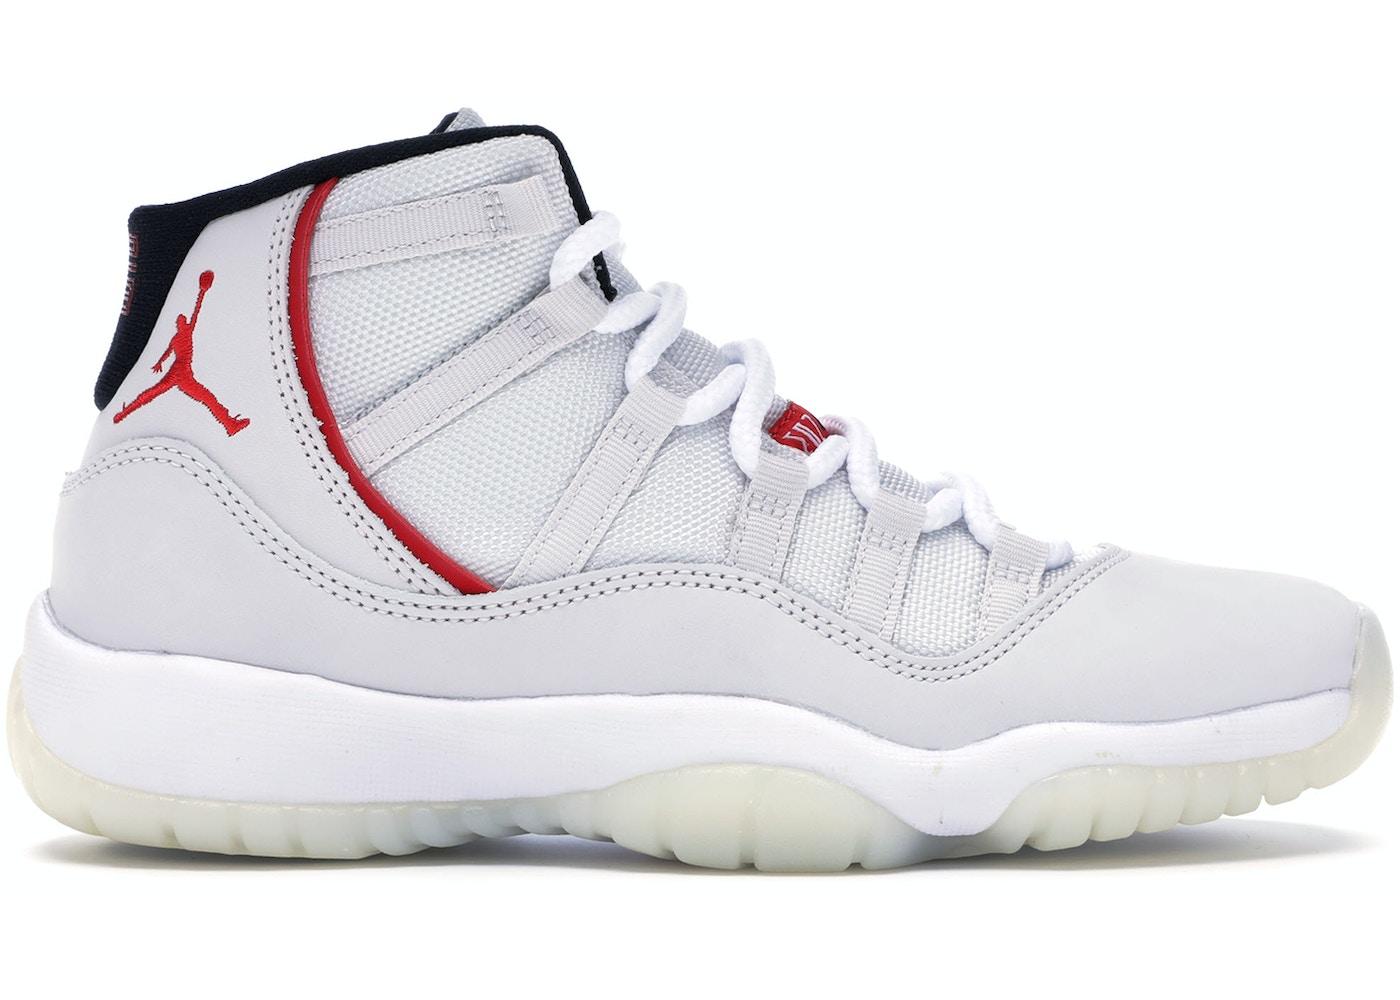 100% authentic 6e88d 85a1b Buy Air Jordan 11 Shoes   Deadstock Sneakers